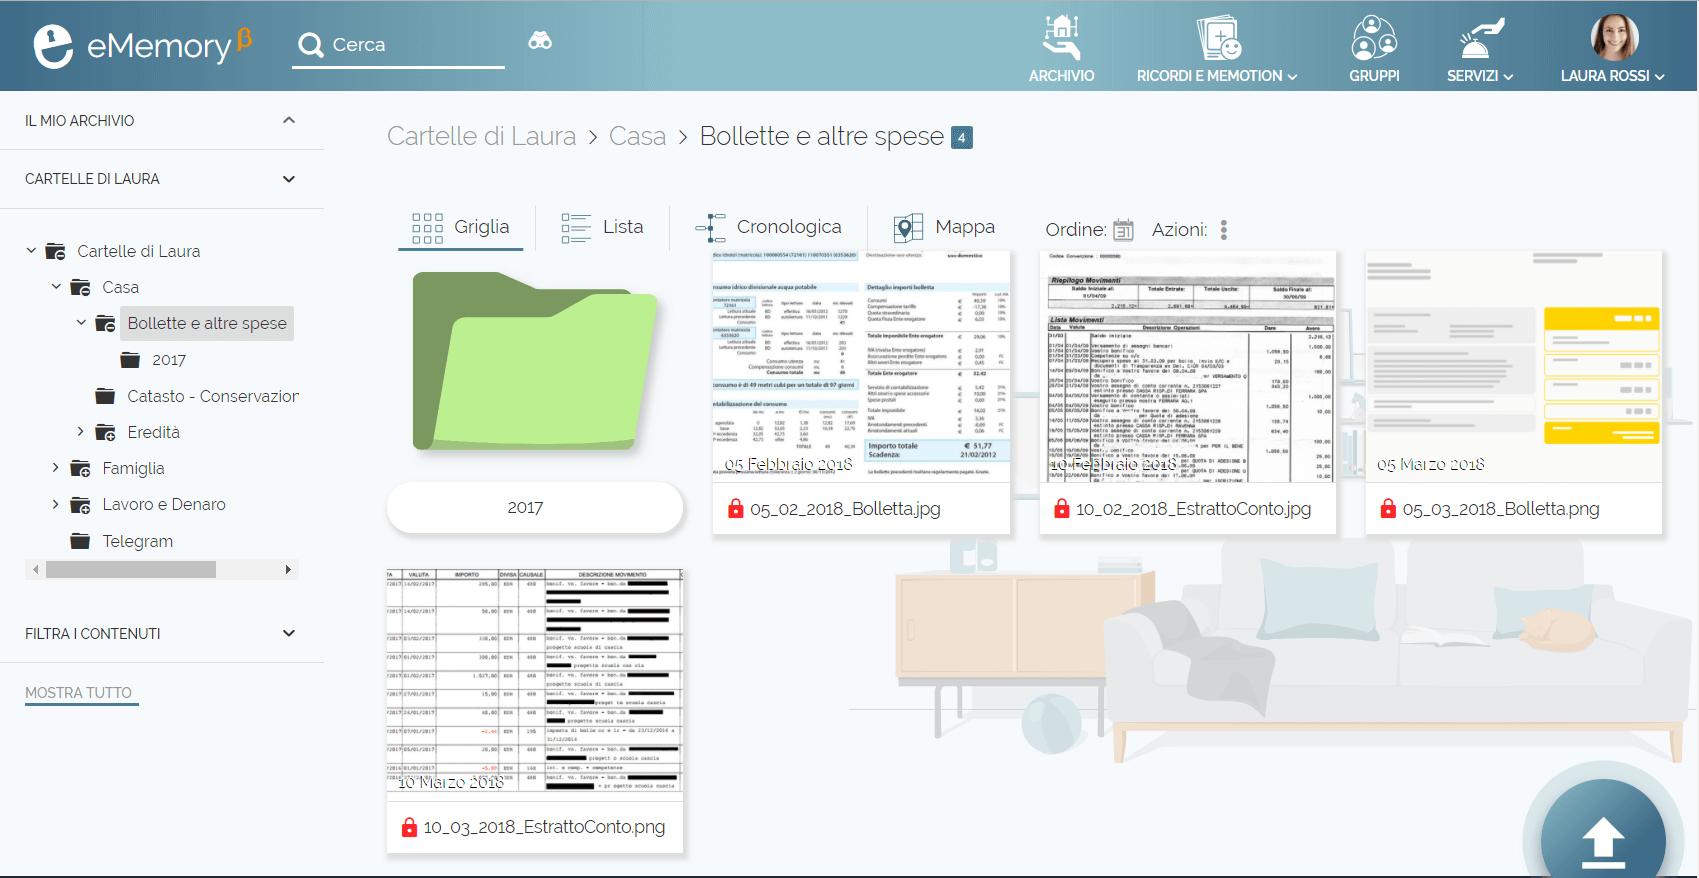 Archive billing